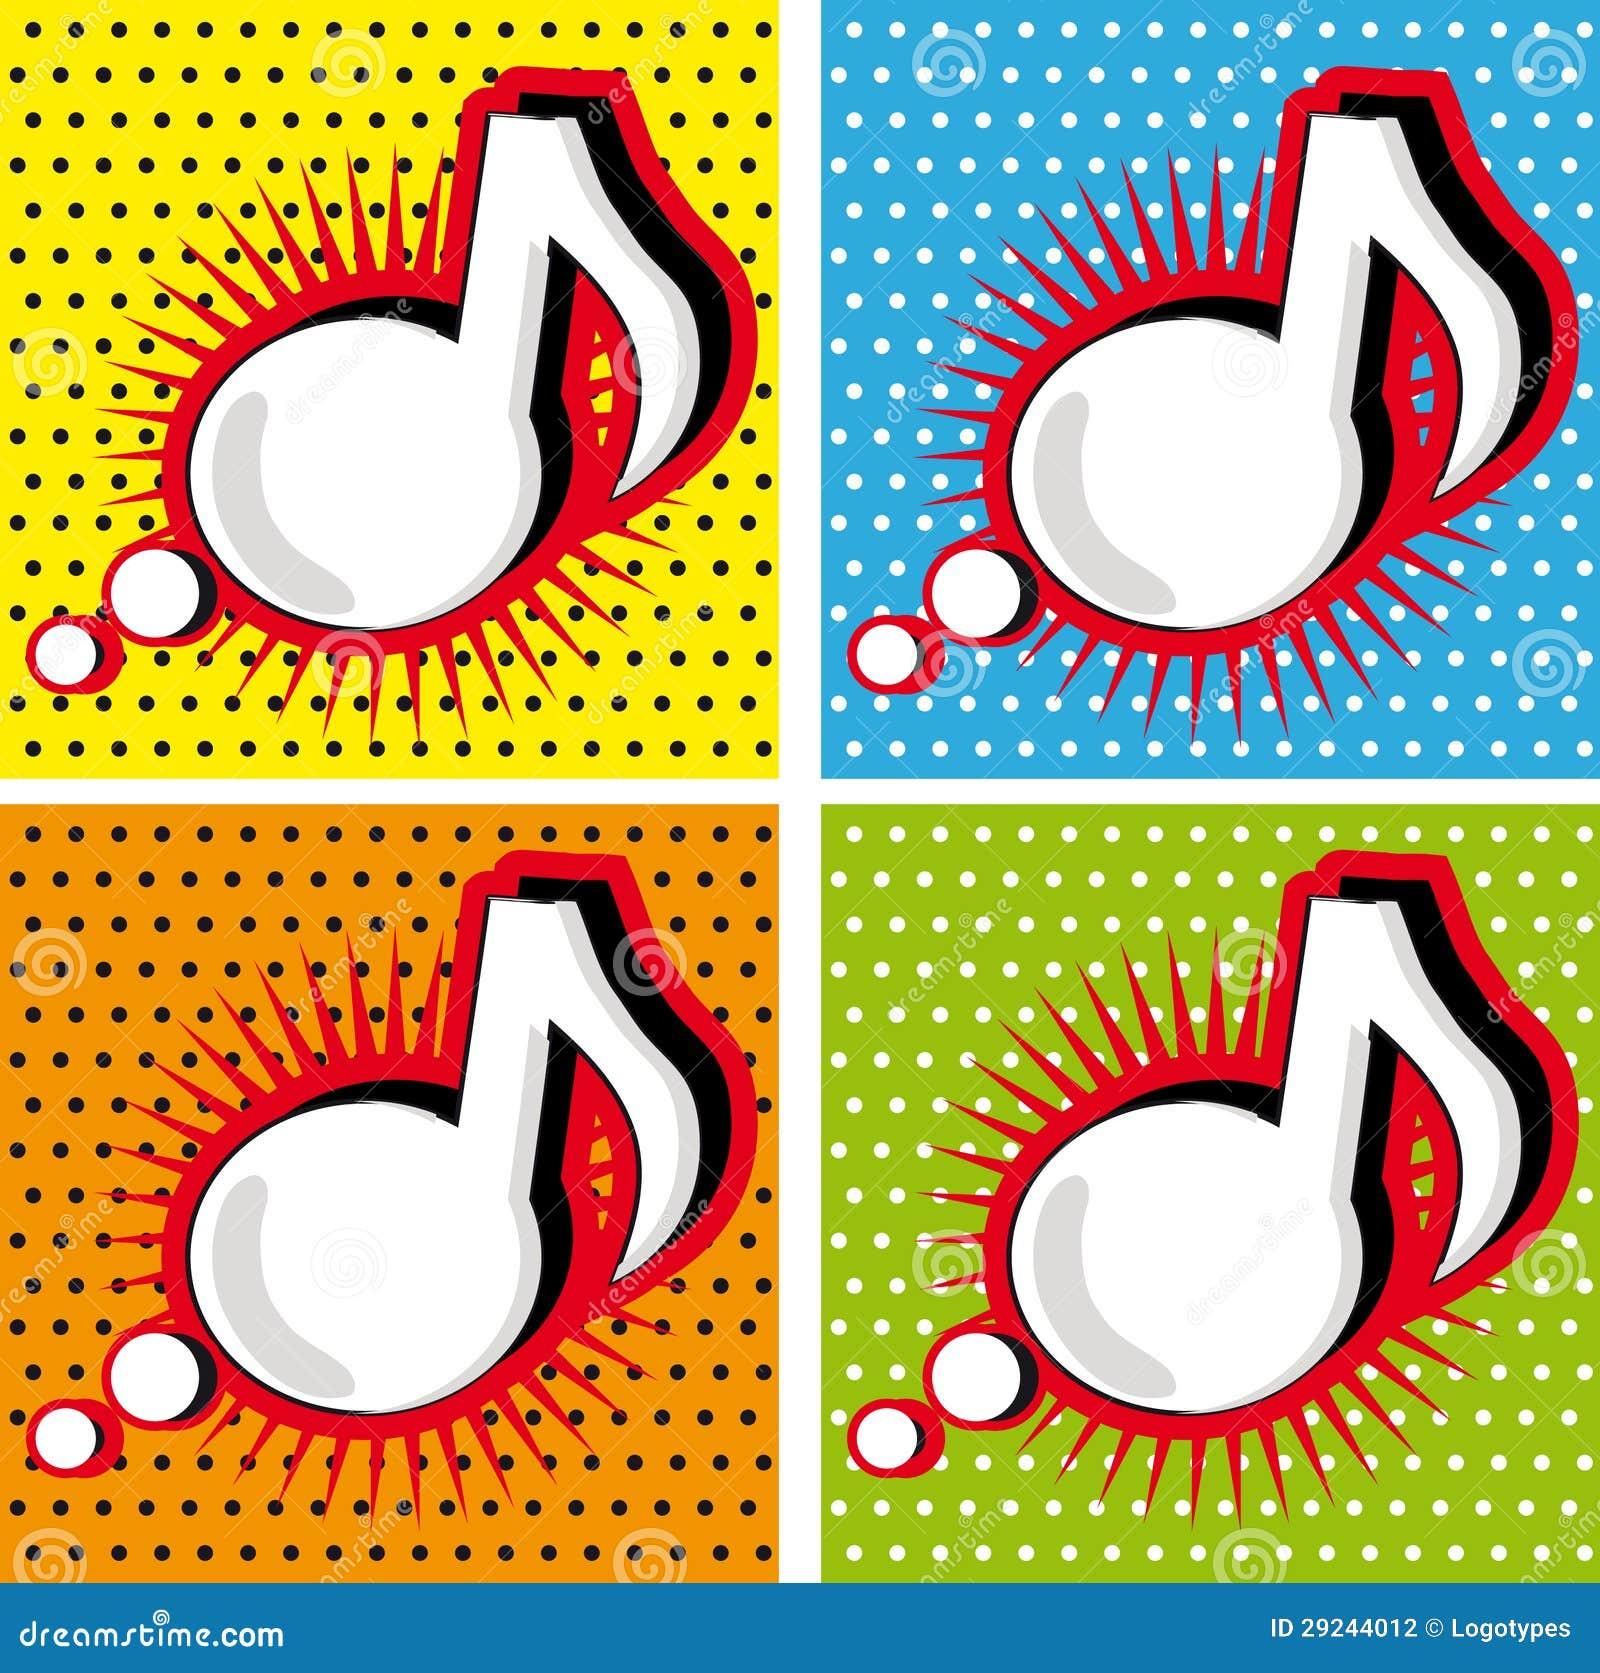 Music program templates free toneelgroepblik Choice Image